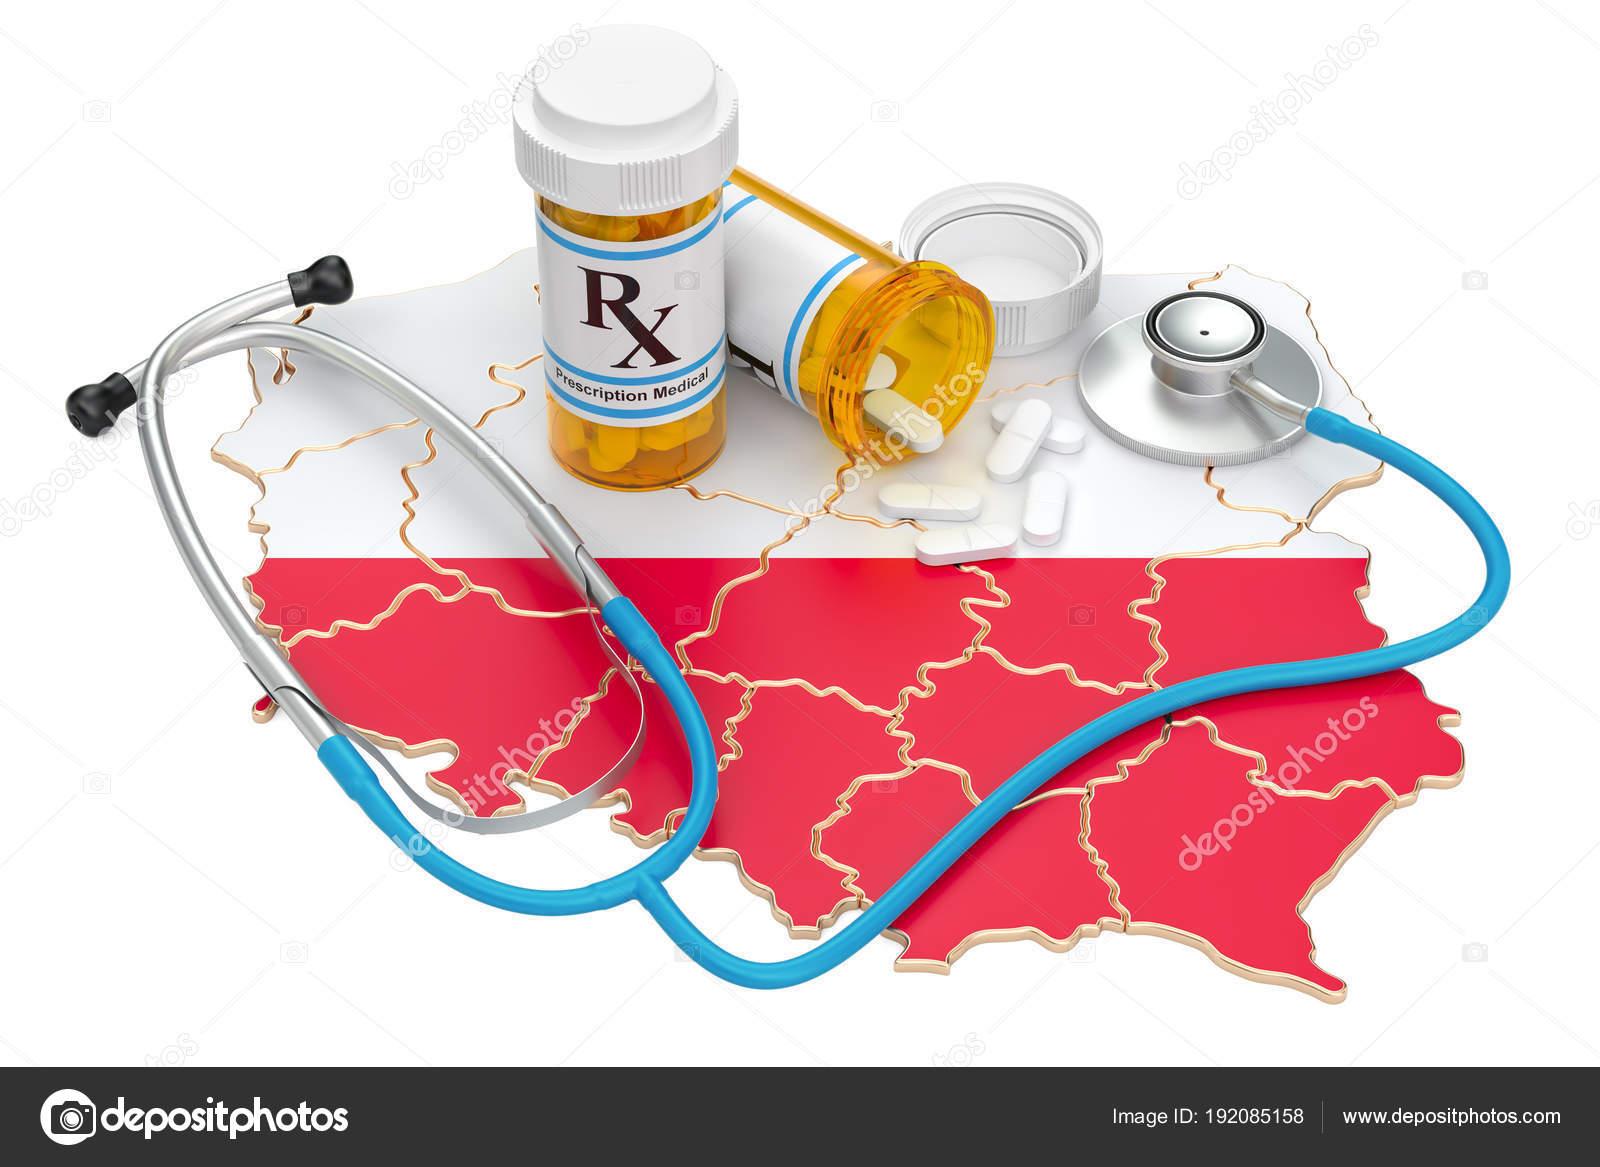 https://st3.depositphotos.com/1439888/19208/i/1600/depositphotos_192085158-stock-photo-healthcare-in-poland-concept-3d.jpg